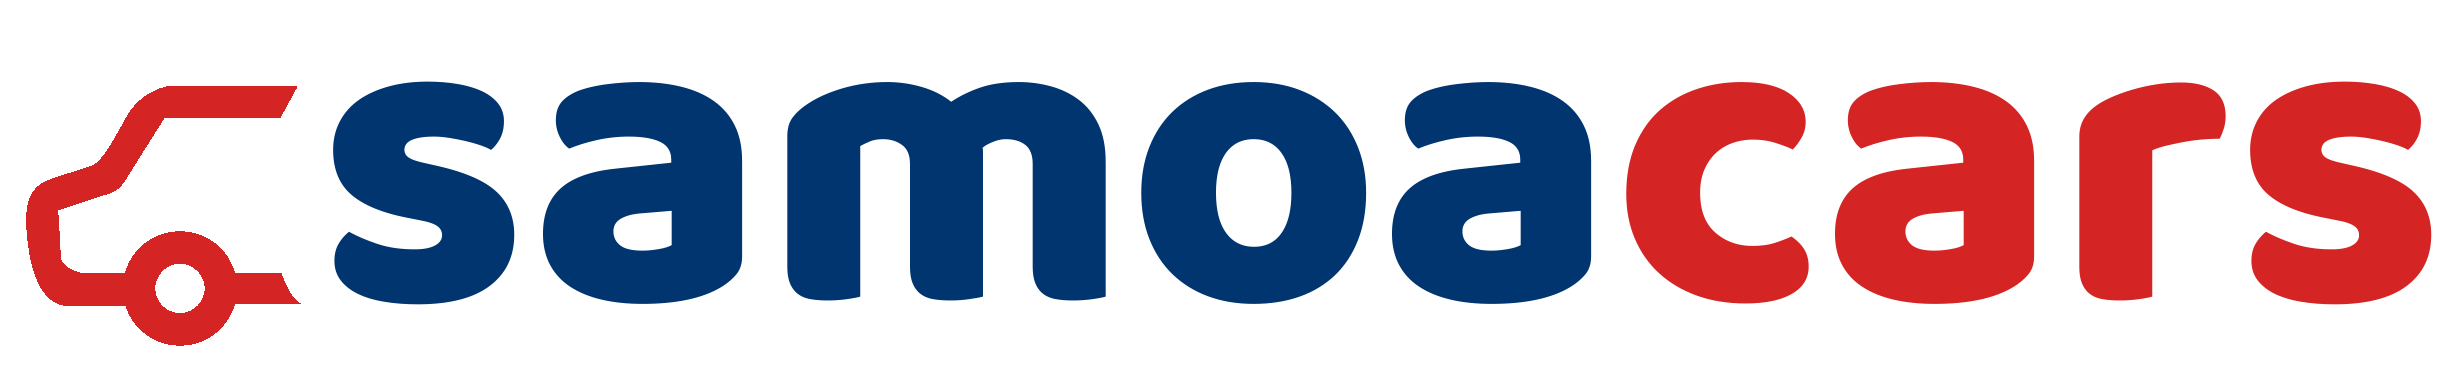 Samoacars logo